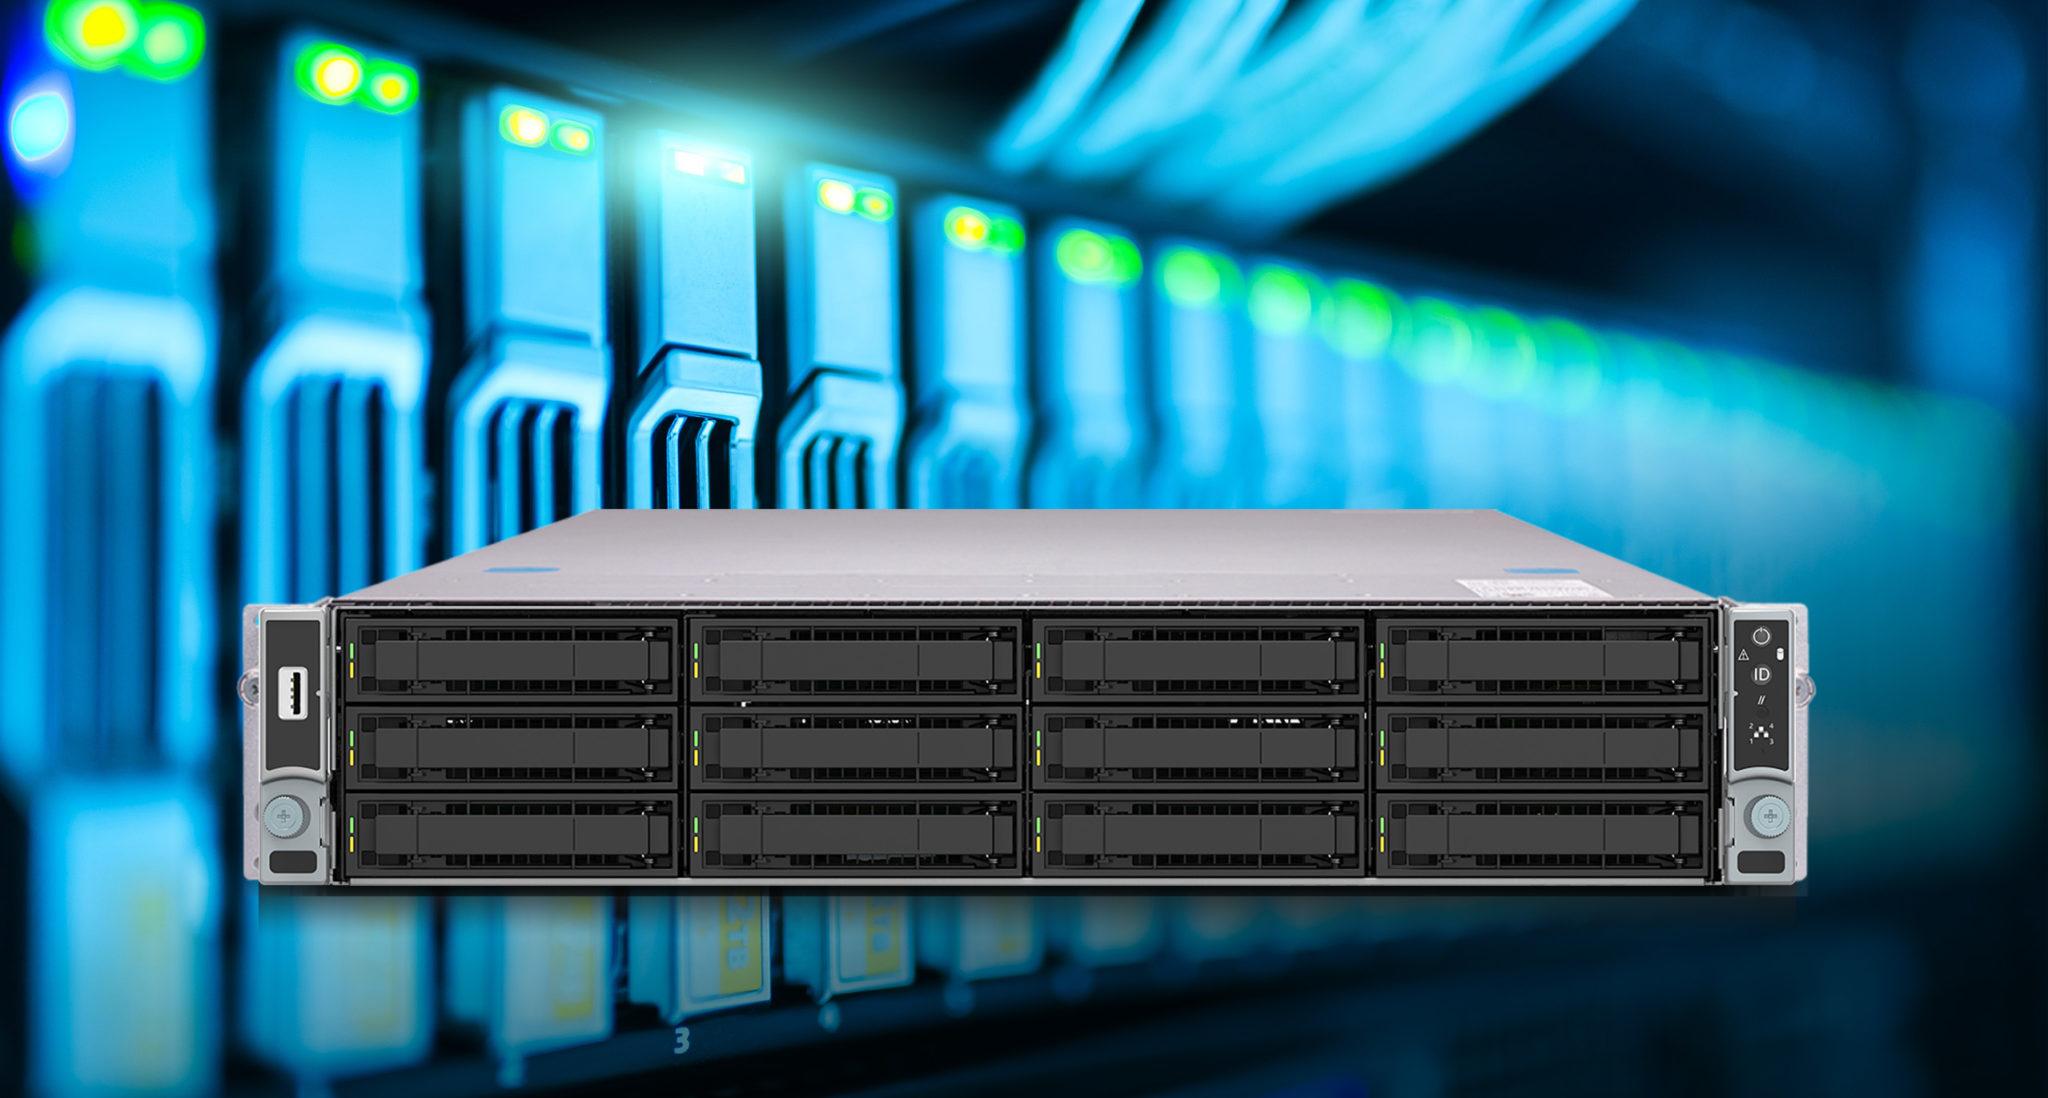 Extrema Server Rack 2U